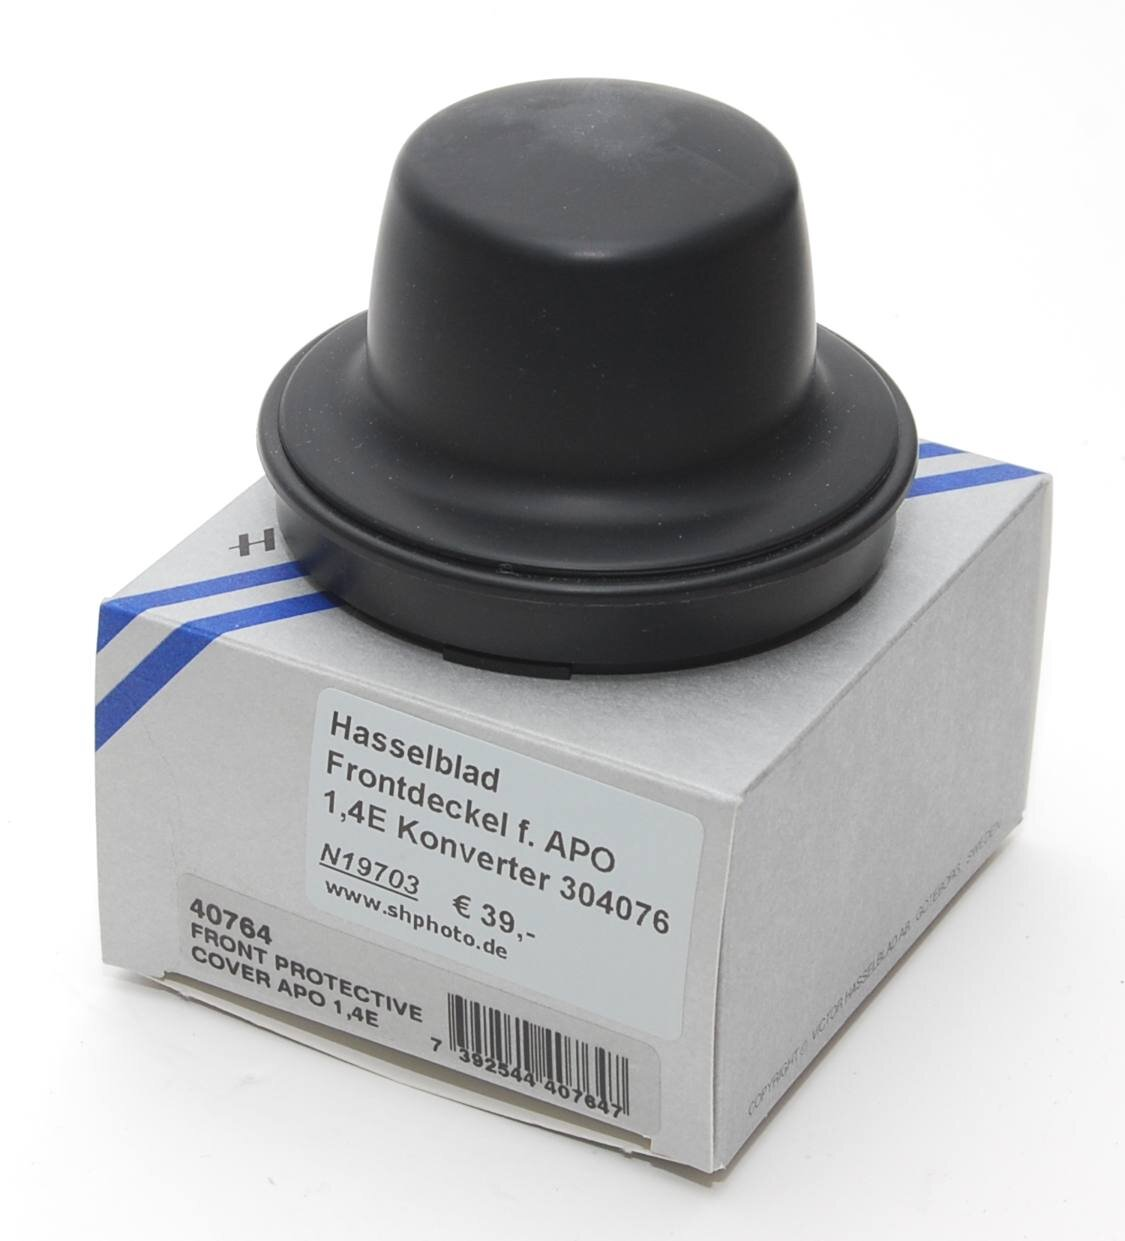 Hasselblad Frontdeckel f. APO 1,4E Konverter 30407